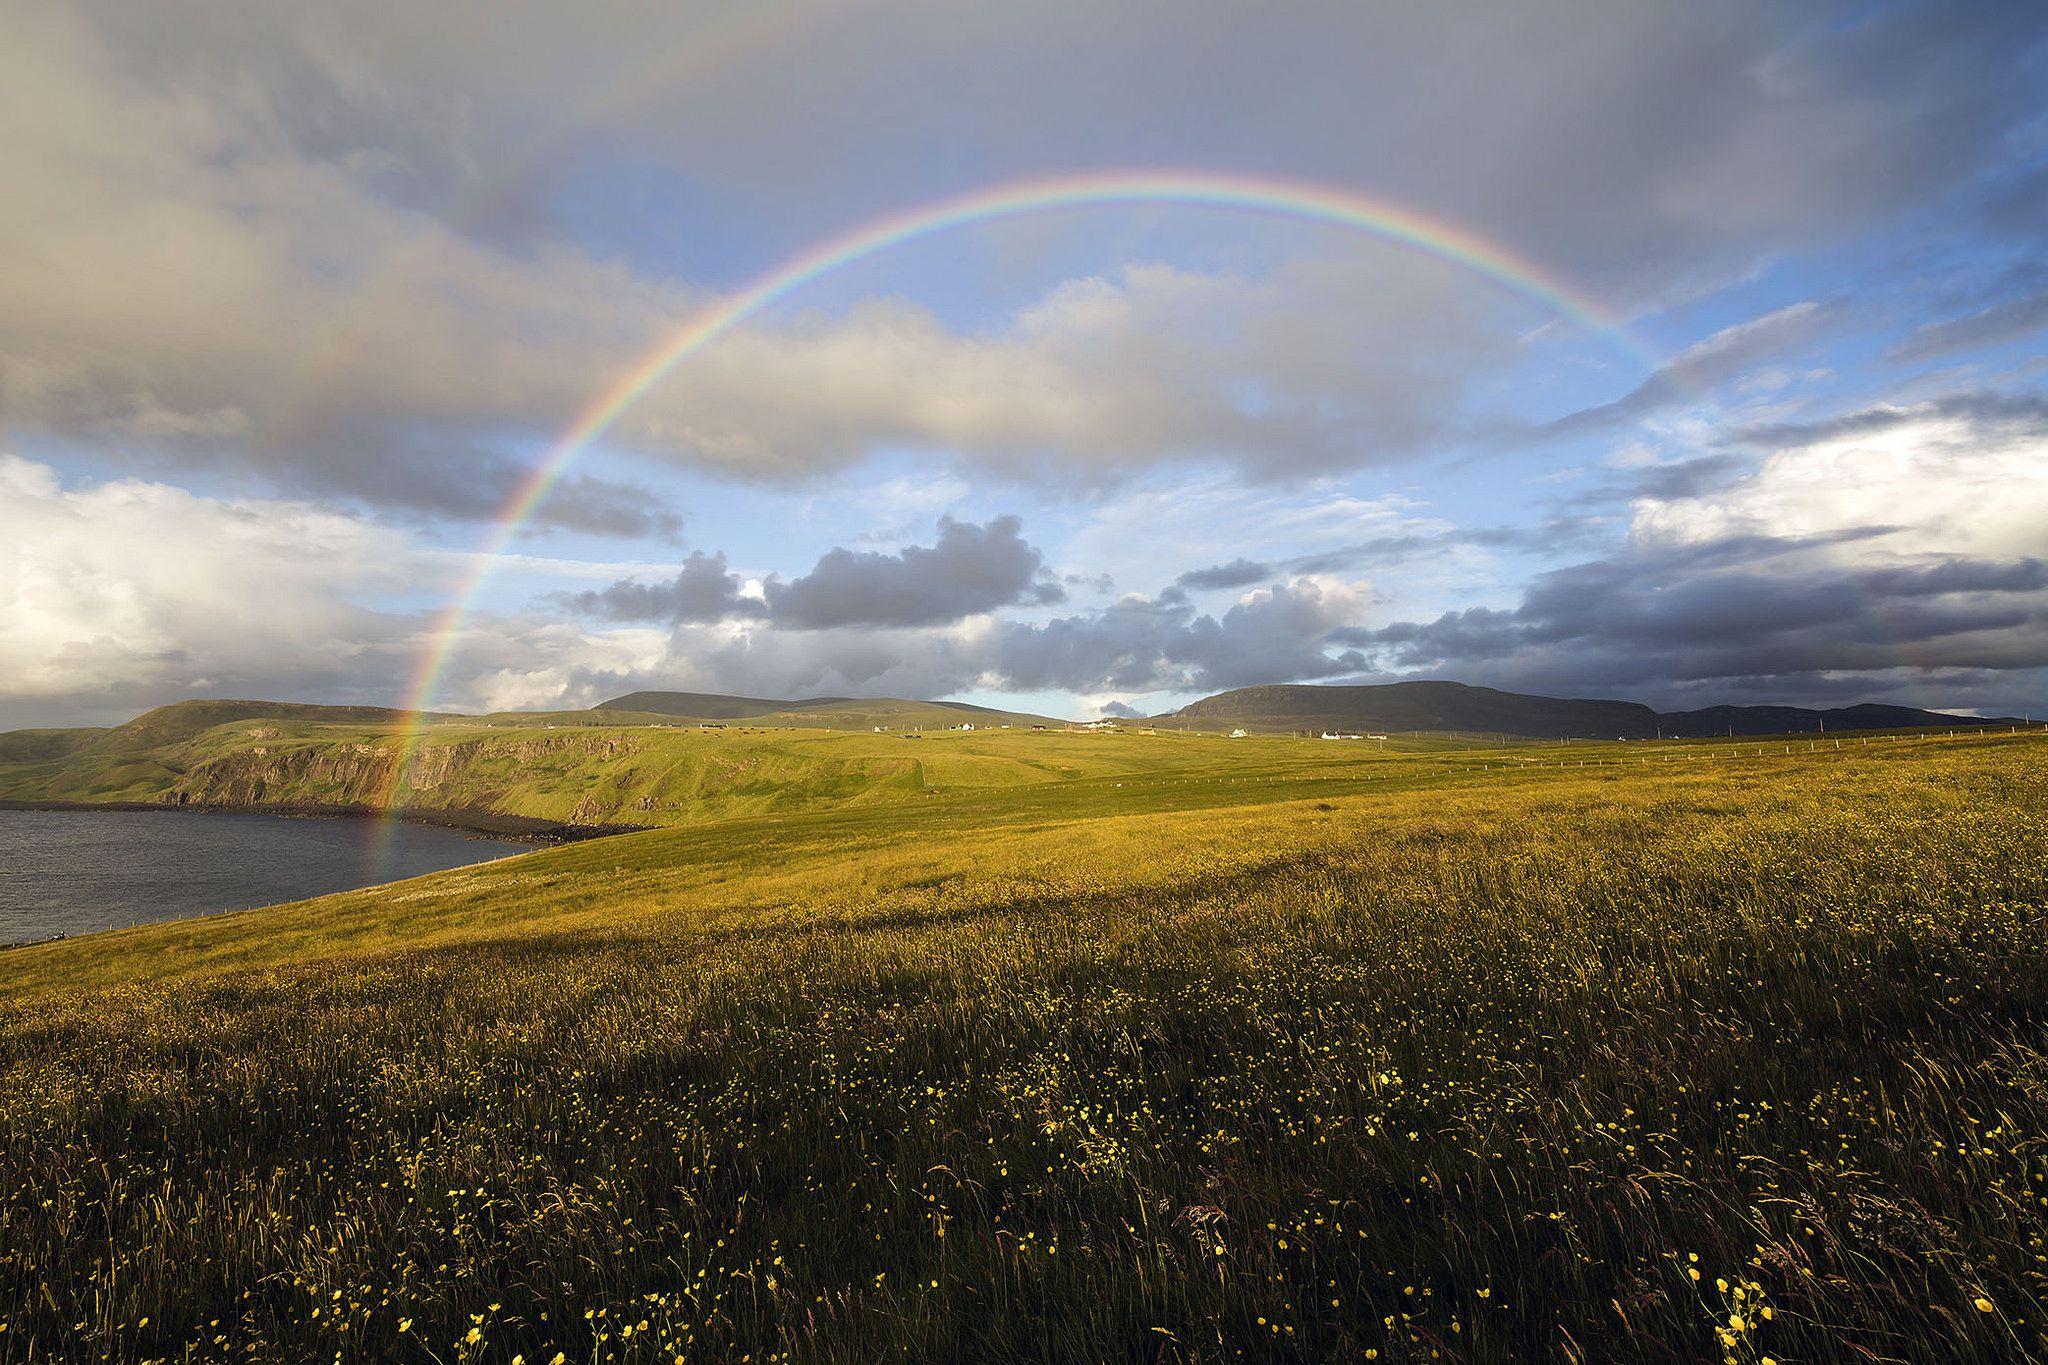 https://flic.kr/p/K34gC6 | Rainbow over Skye